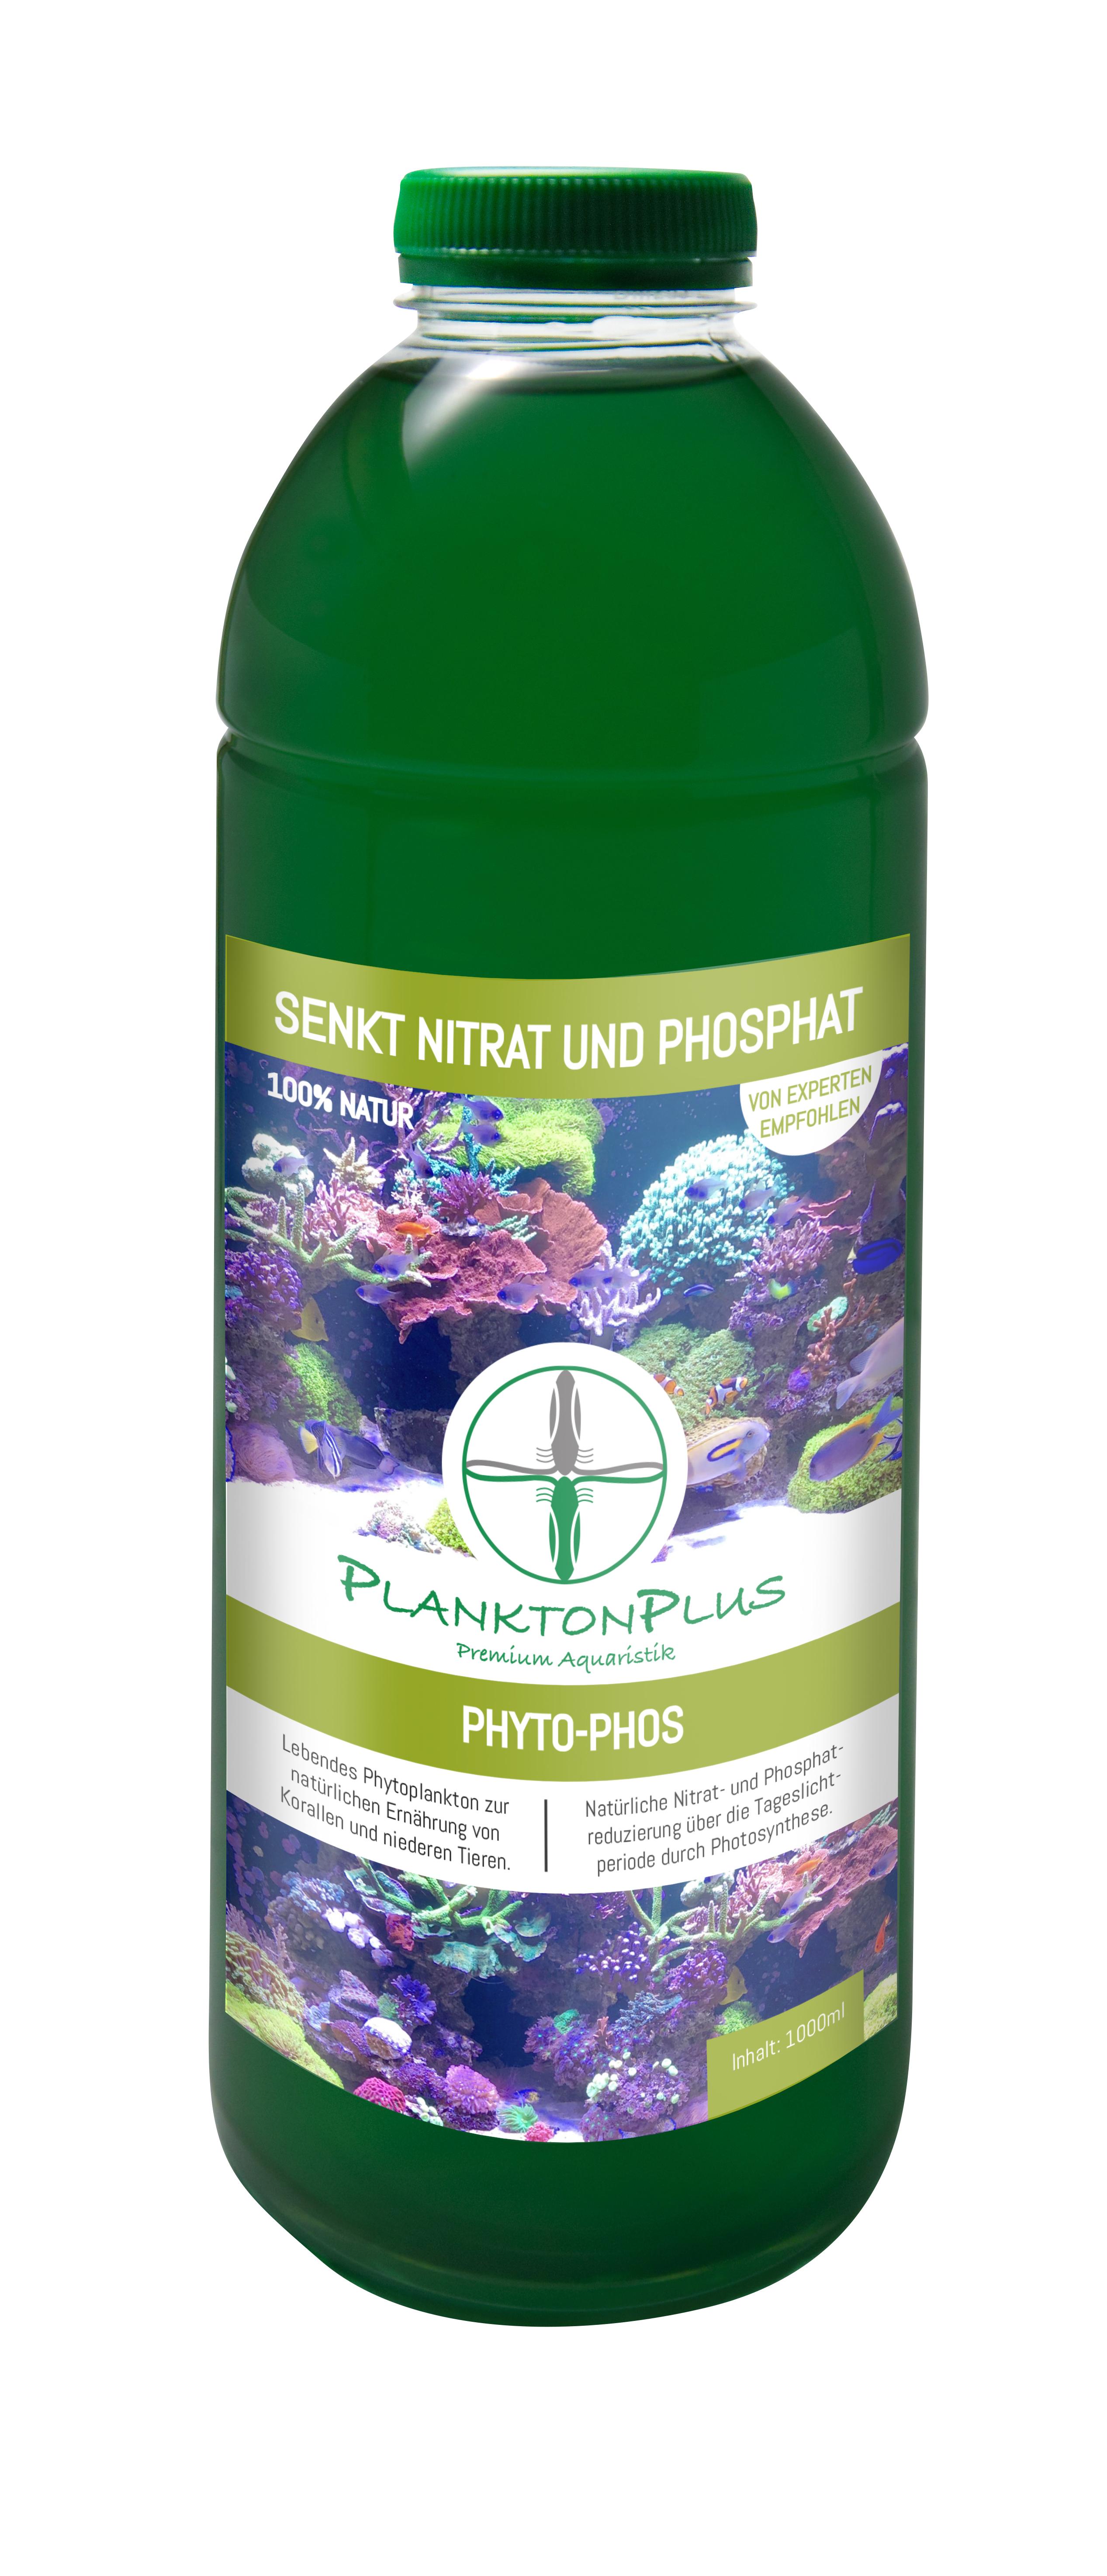 Phyto-Phos - senkt Nitrat und Phosphat